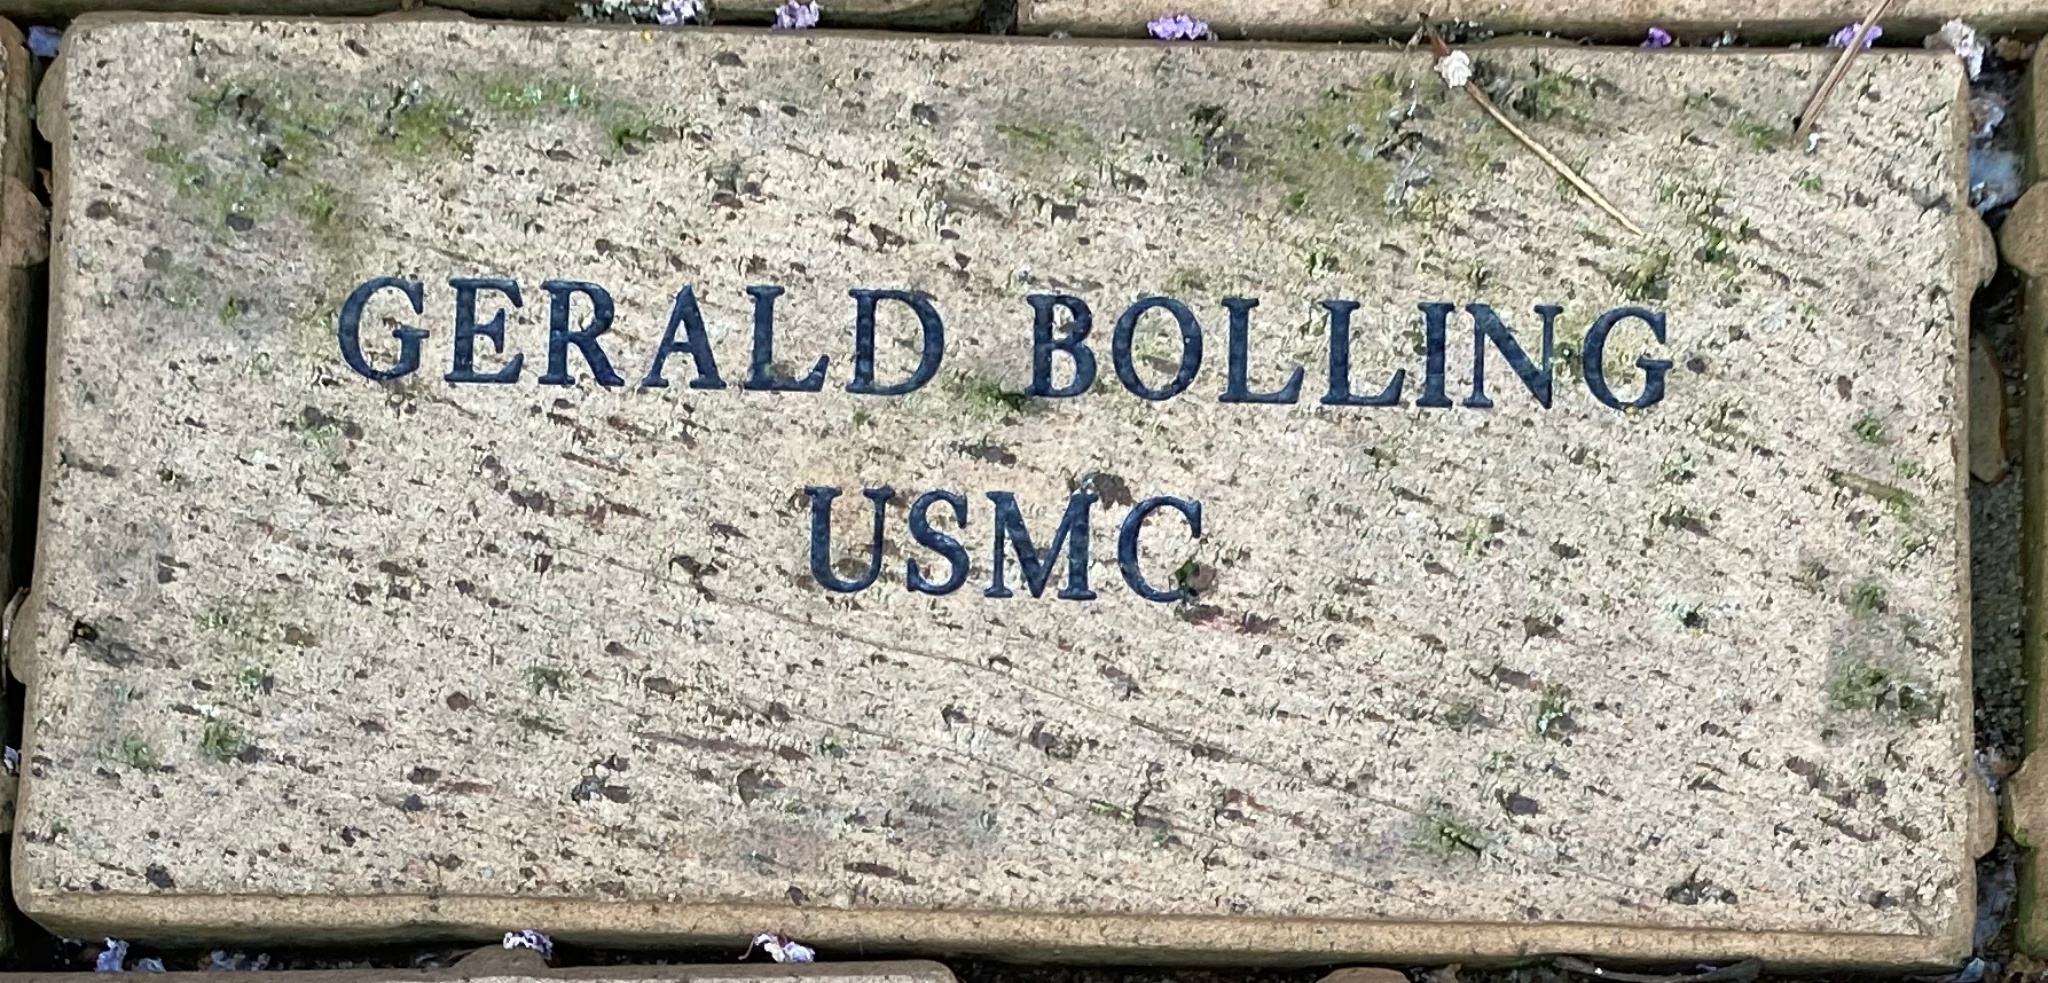 GERALD BOLLING USMC